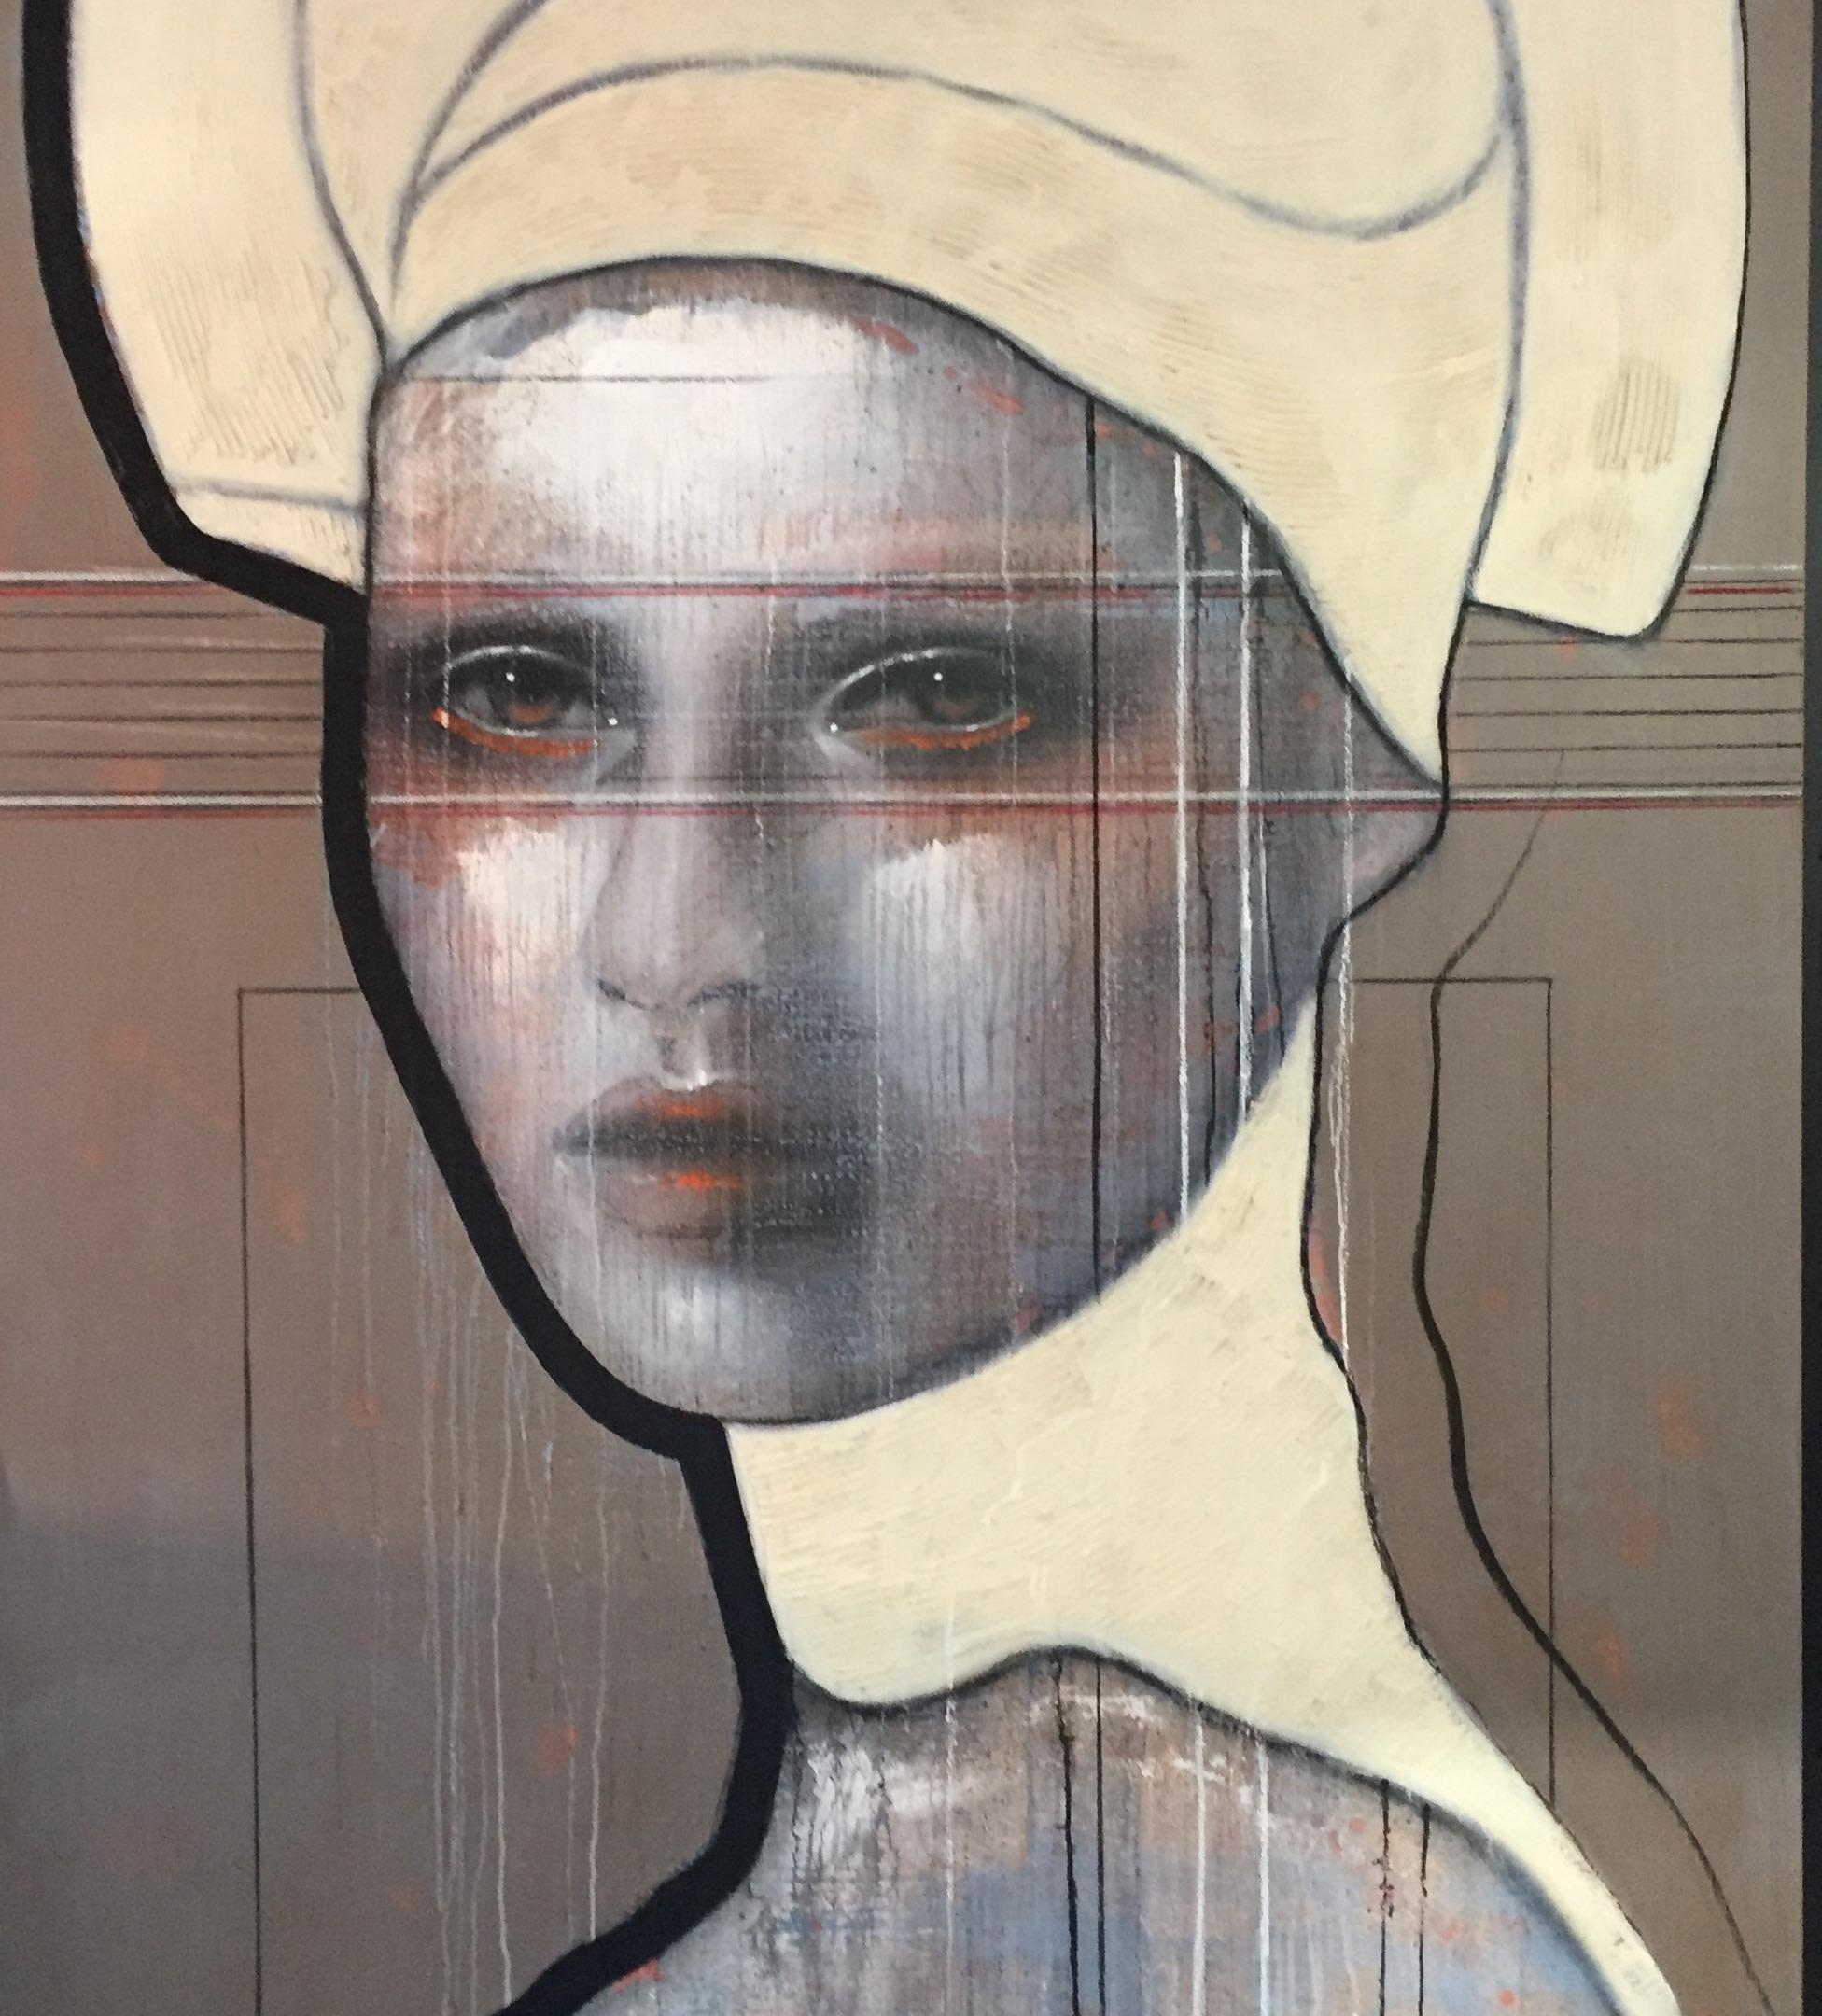 <span class=&#34;link fancybox-details-link&#34;><a href=&#34;/artists/40-ger-doornink/works/4380-ger-doornink-the-dutch-2017/&#34;>View Detail Page</a></span><div class=&#34;artist&#34;><strong>Ger Doornink</strong></div> <div class=&#34;title&#34;><em>The Dutch</em>, 2017</div> <div class=&#34;medium&#34;>Oil on canvas</div> <div class=&#34;dimensions&#34;>190 x 140 cm</div>